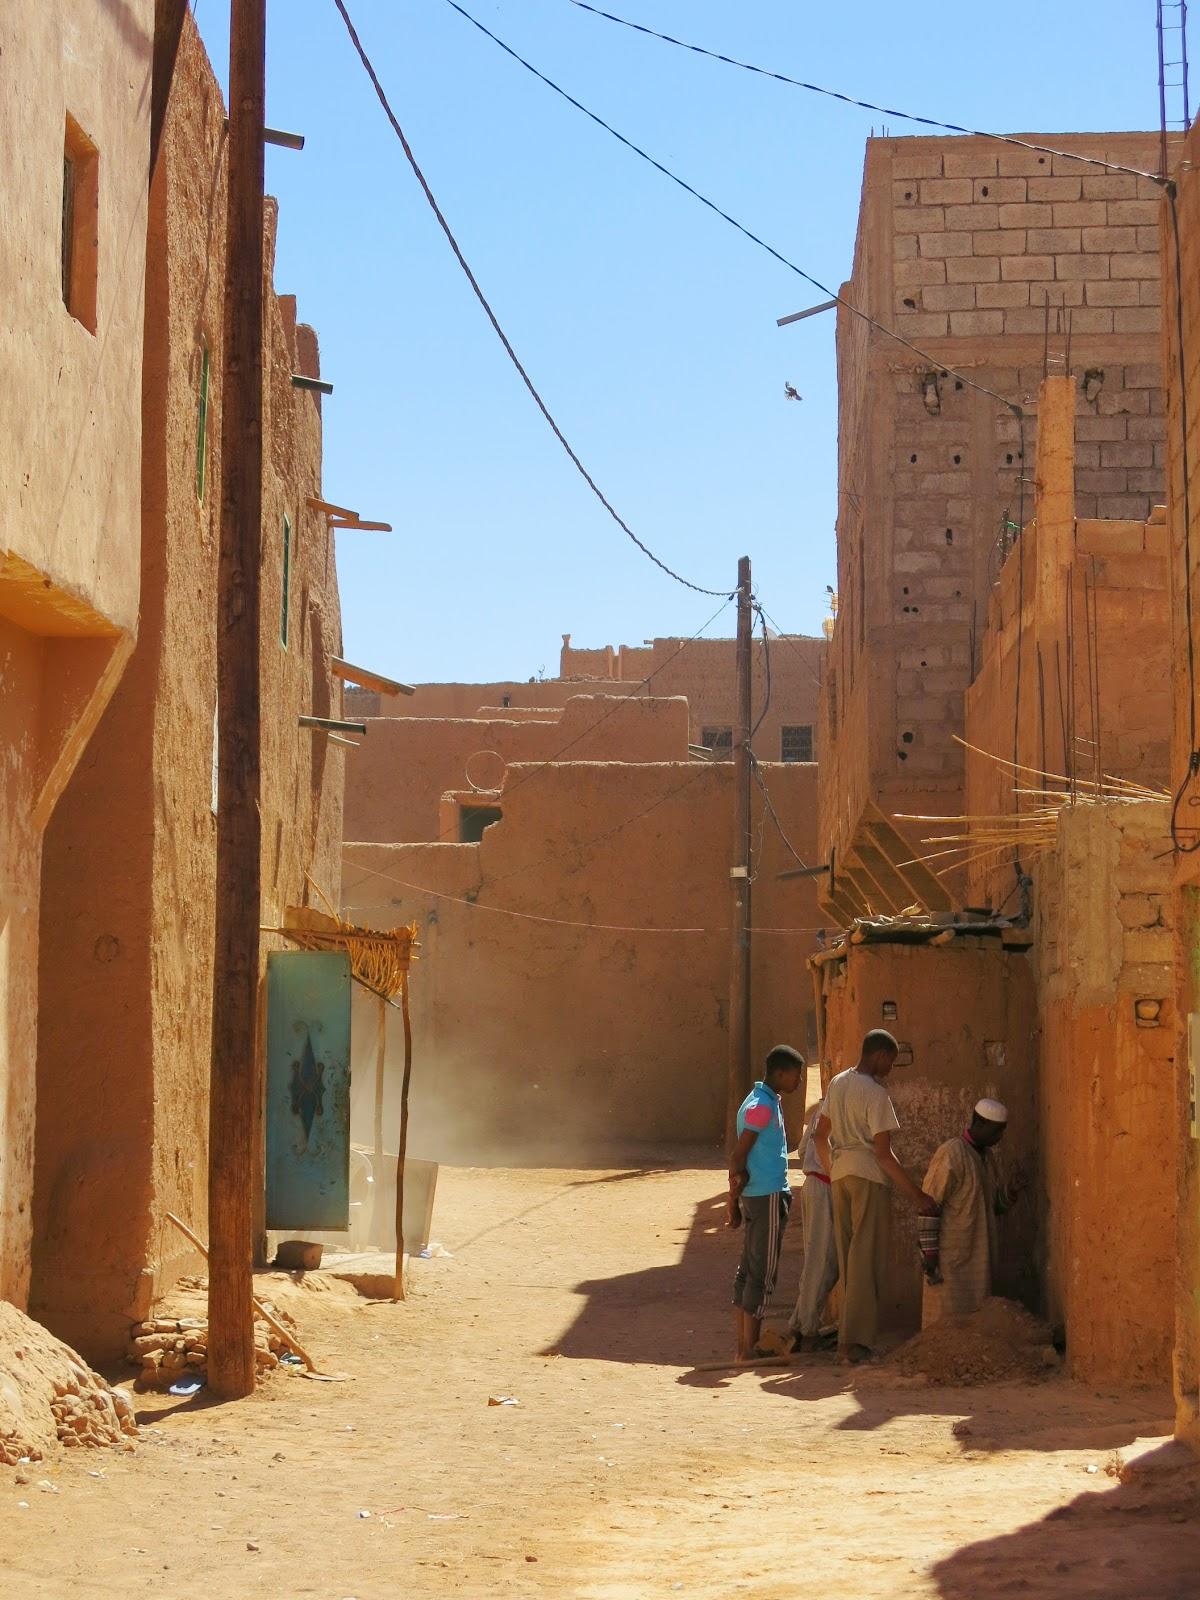 Tamghout i Marocko